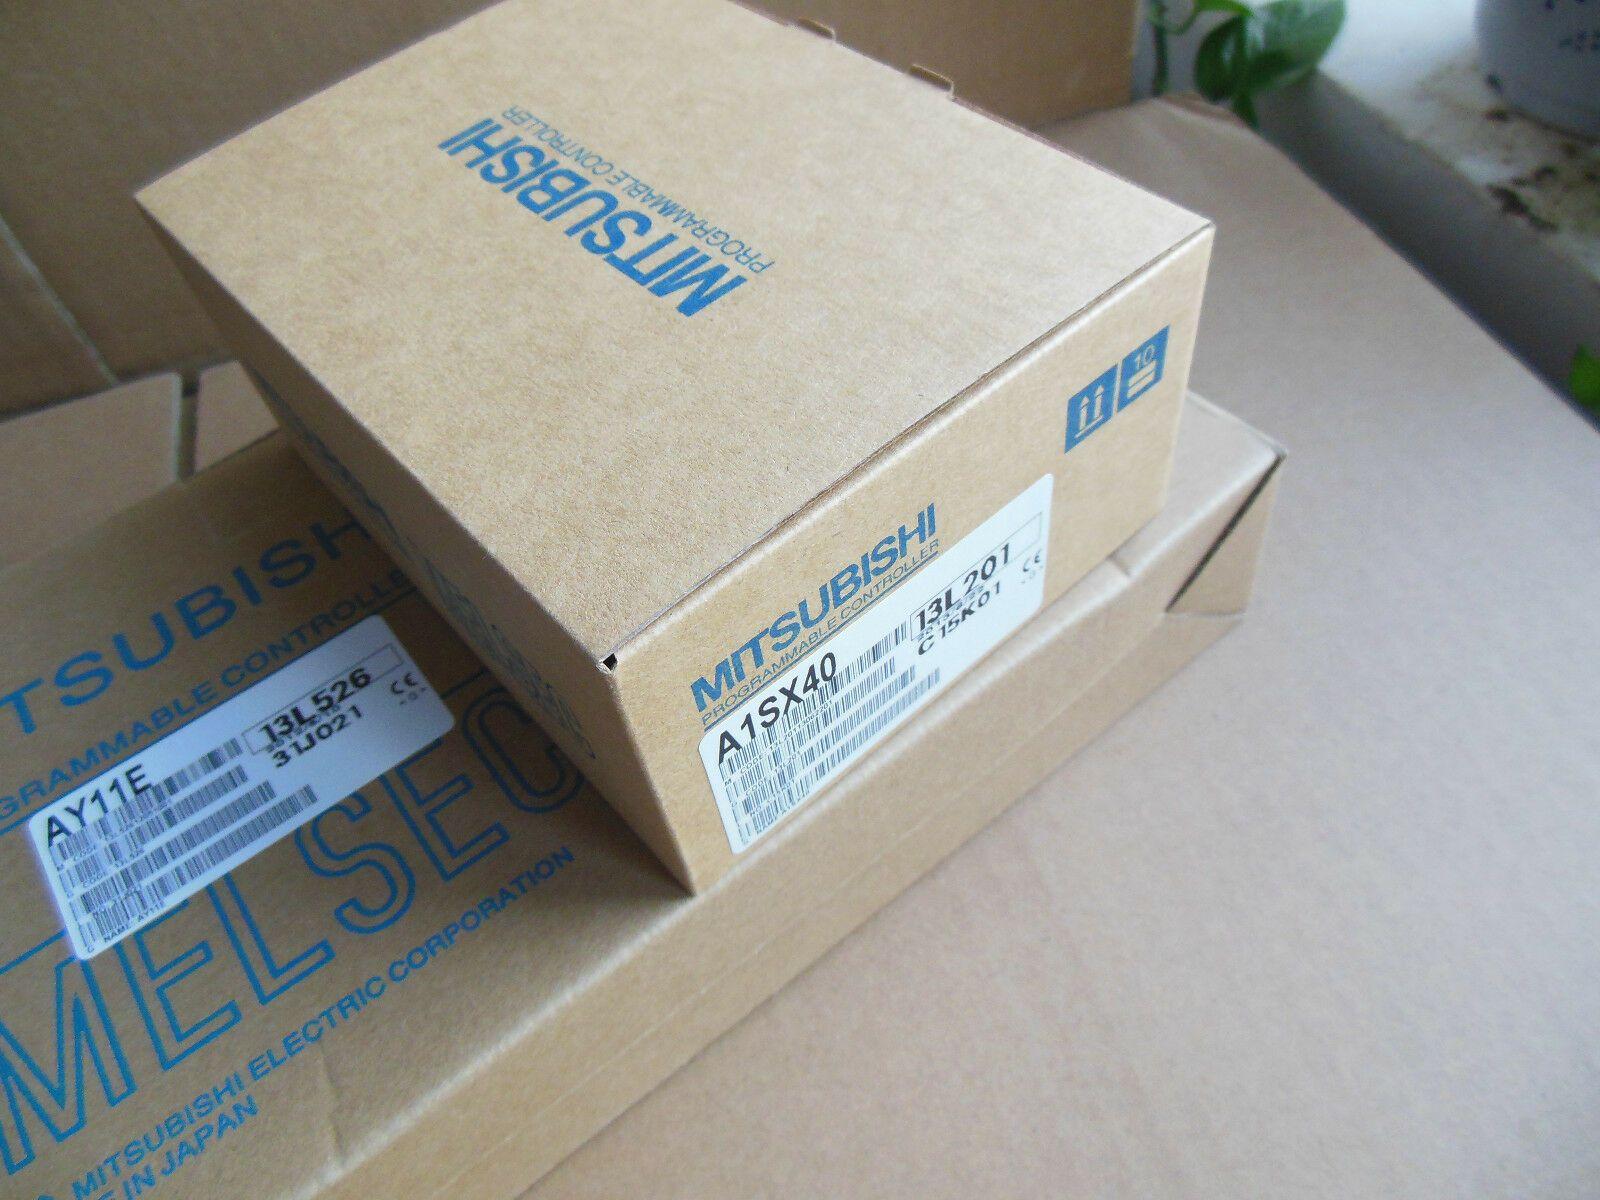 Mitsubishi Mitsubishi MODULE A1SX40 FREE EXPEDITED SHIPPING جديد في صندوق